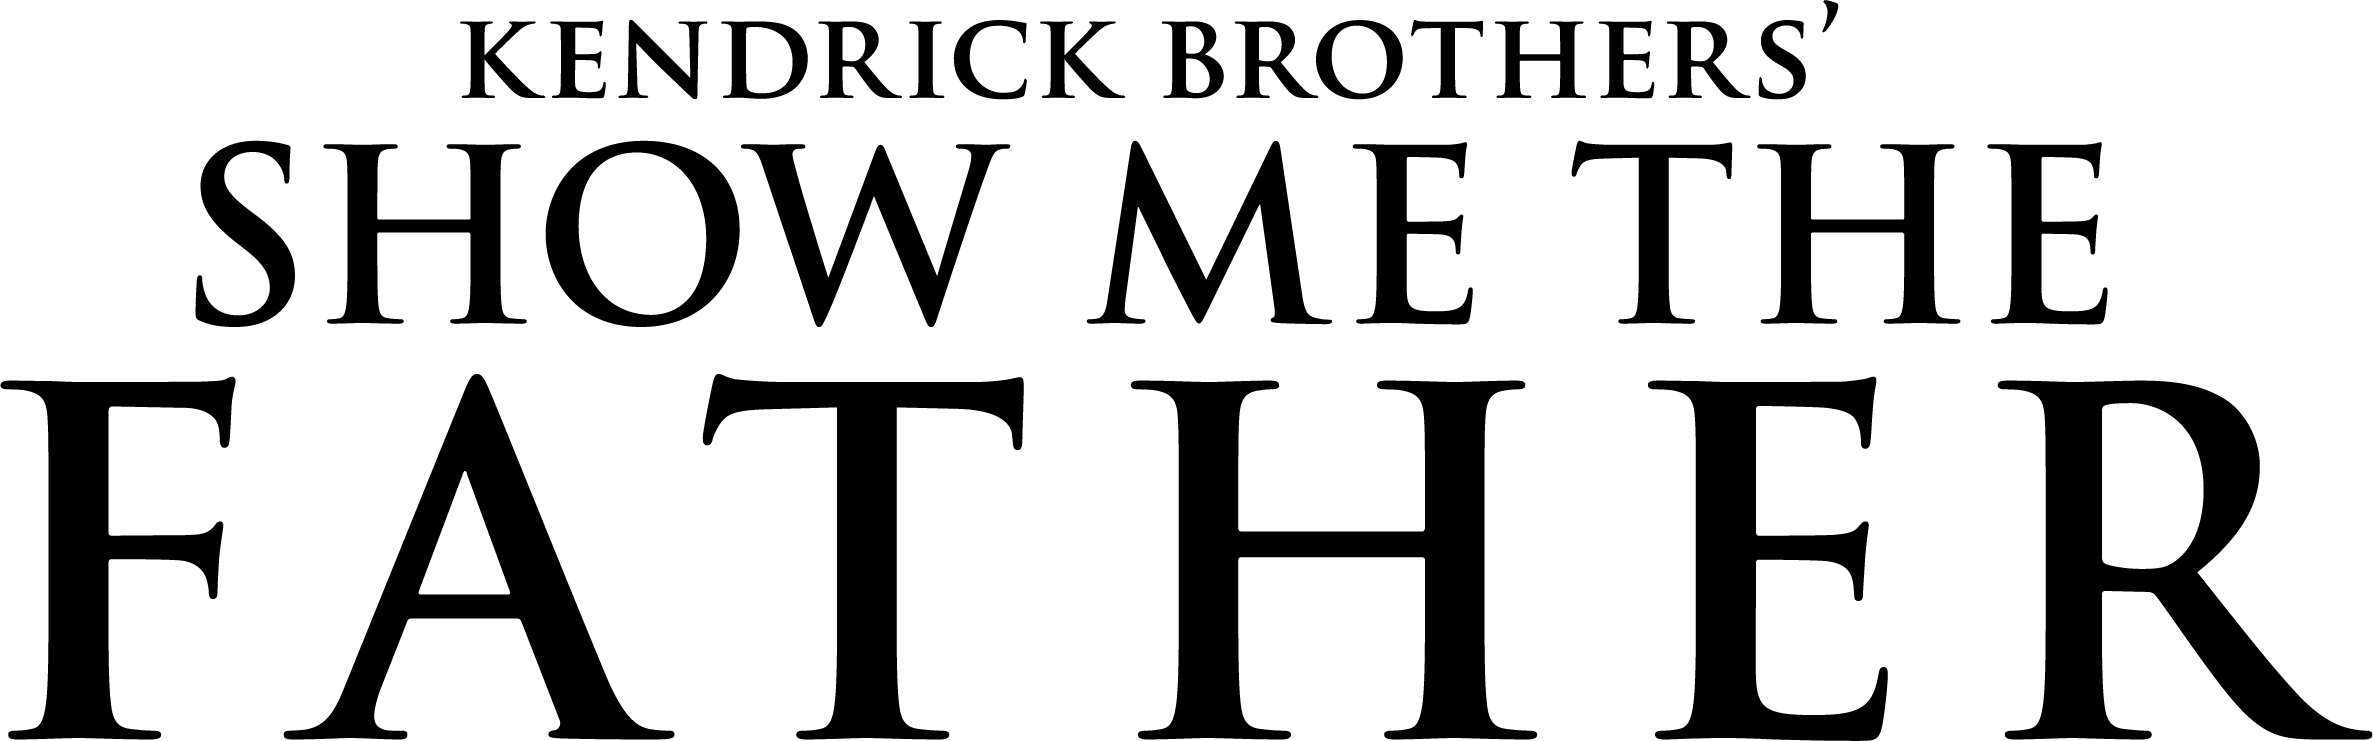 SMTF logo